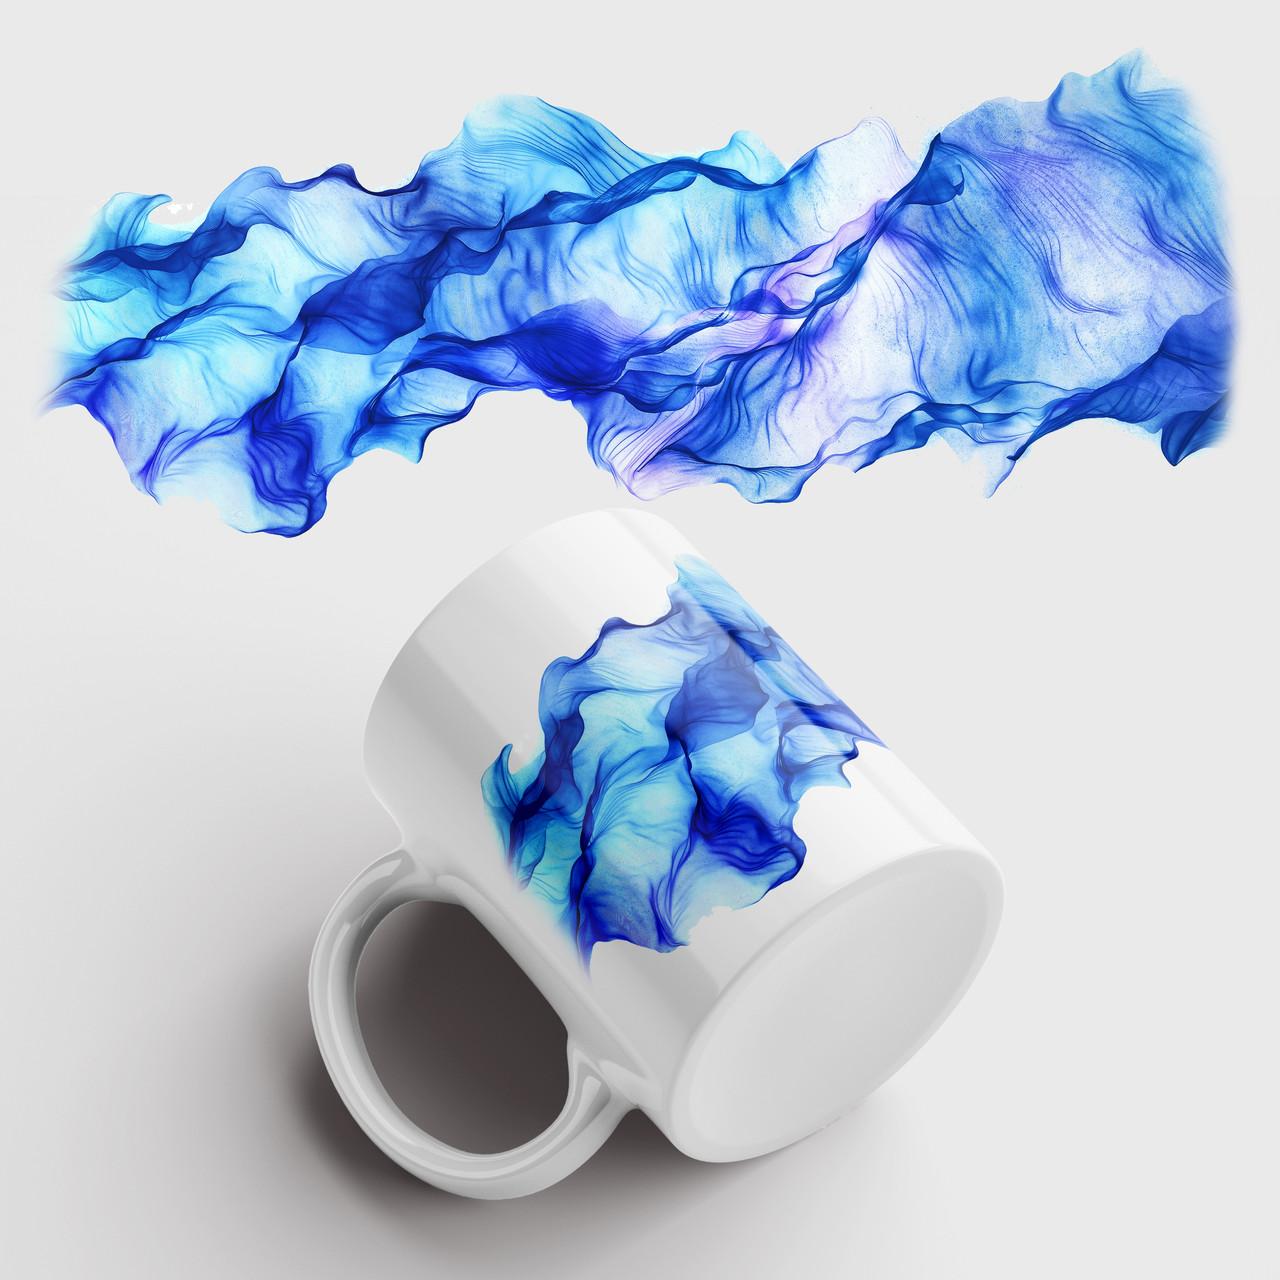 Кружка с принтом Синий Дым. Smoke art. Чашка с фото